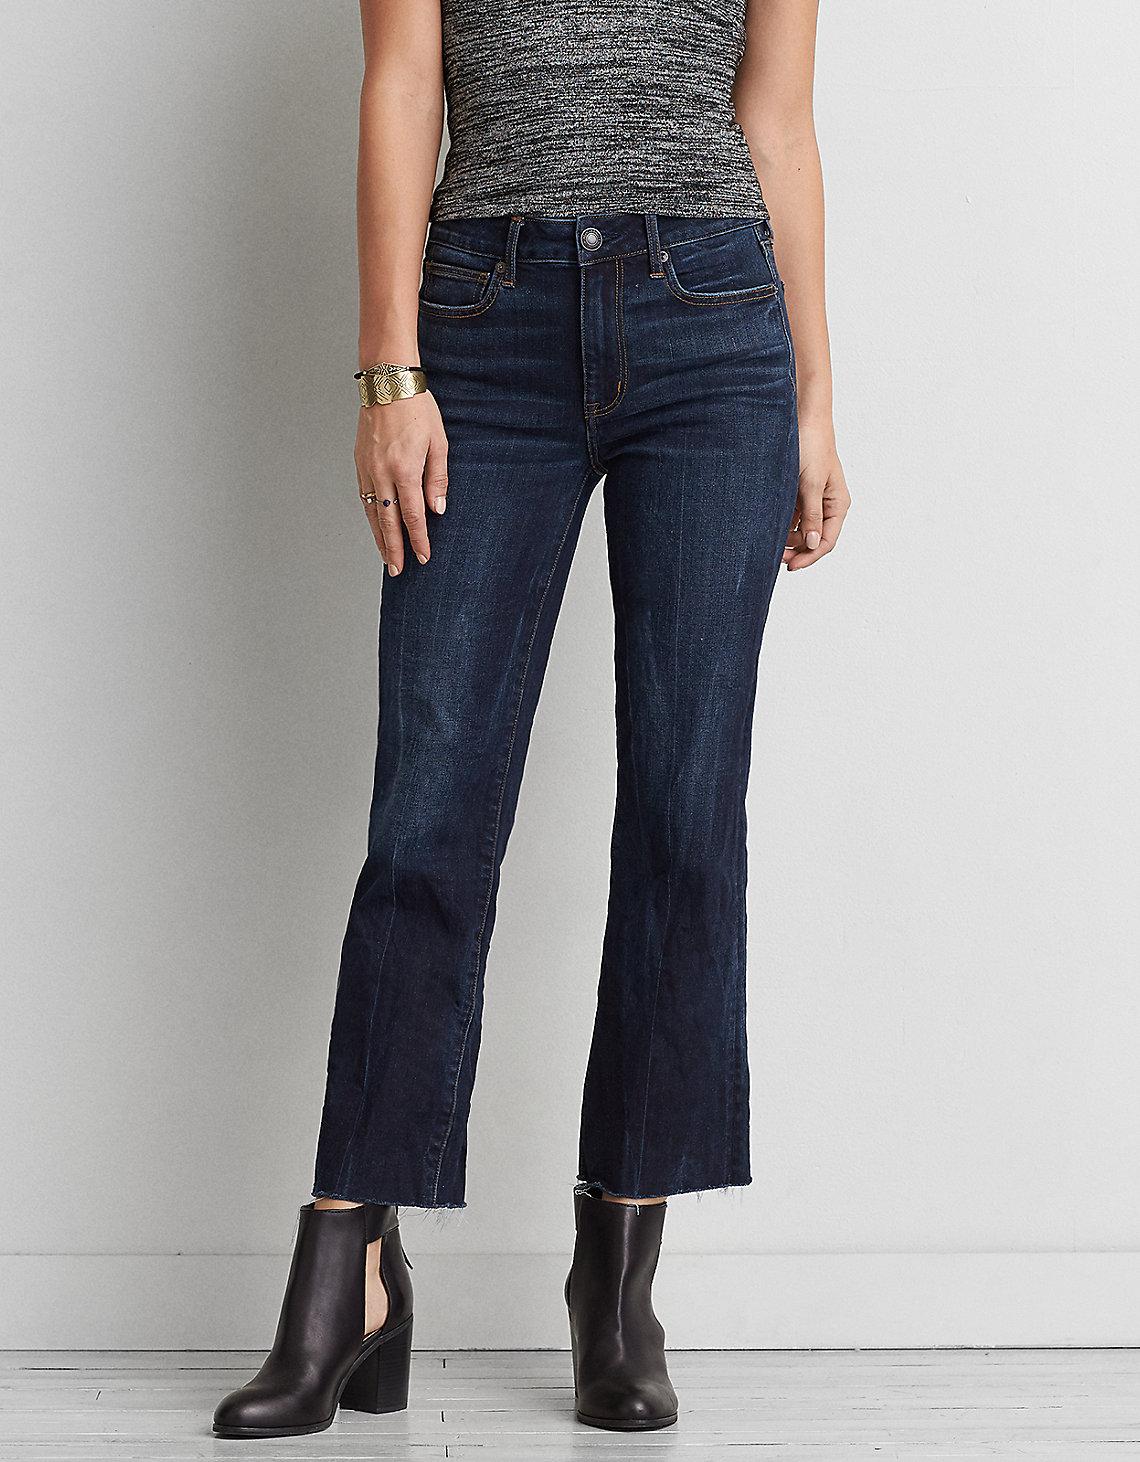 American Eagle Select Women's & Men's Jeans $17.99 & More + Free S/H ShopRunner $25+